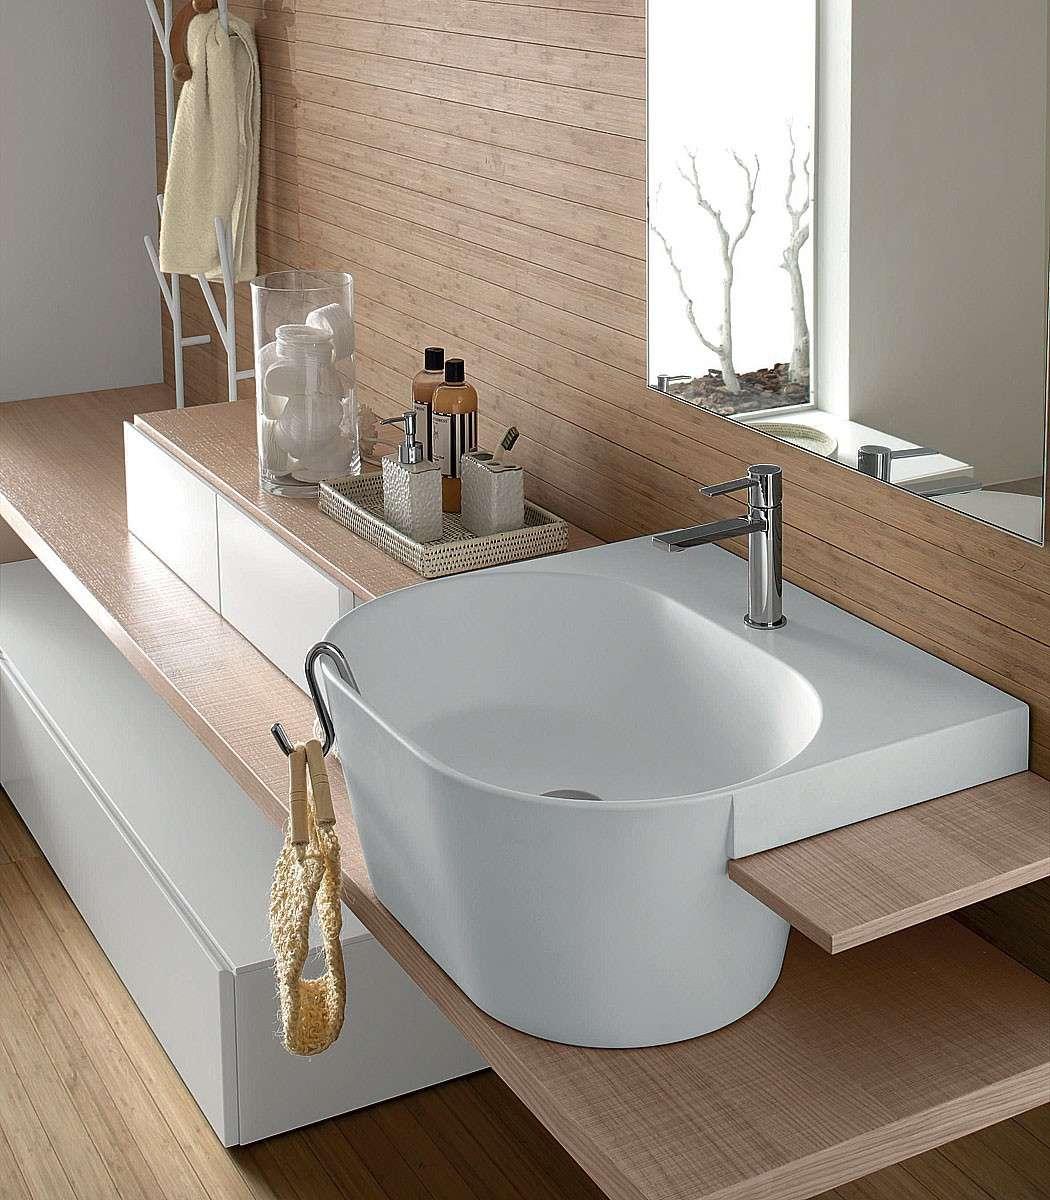 Arredamento del bagno